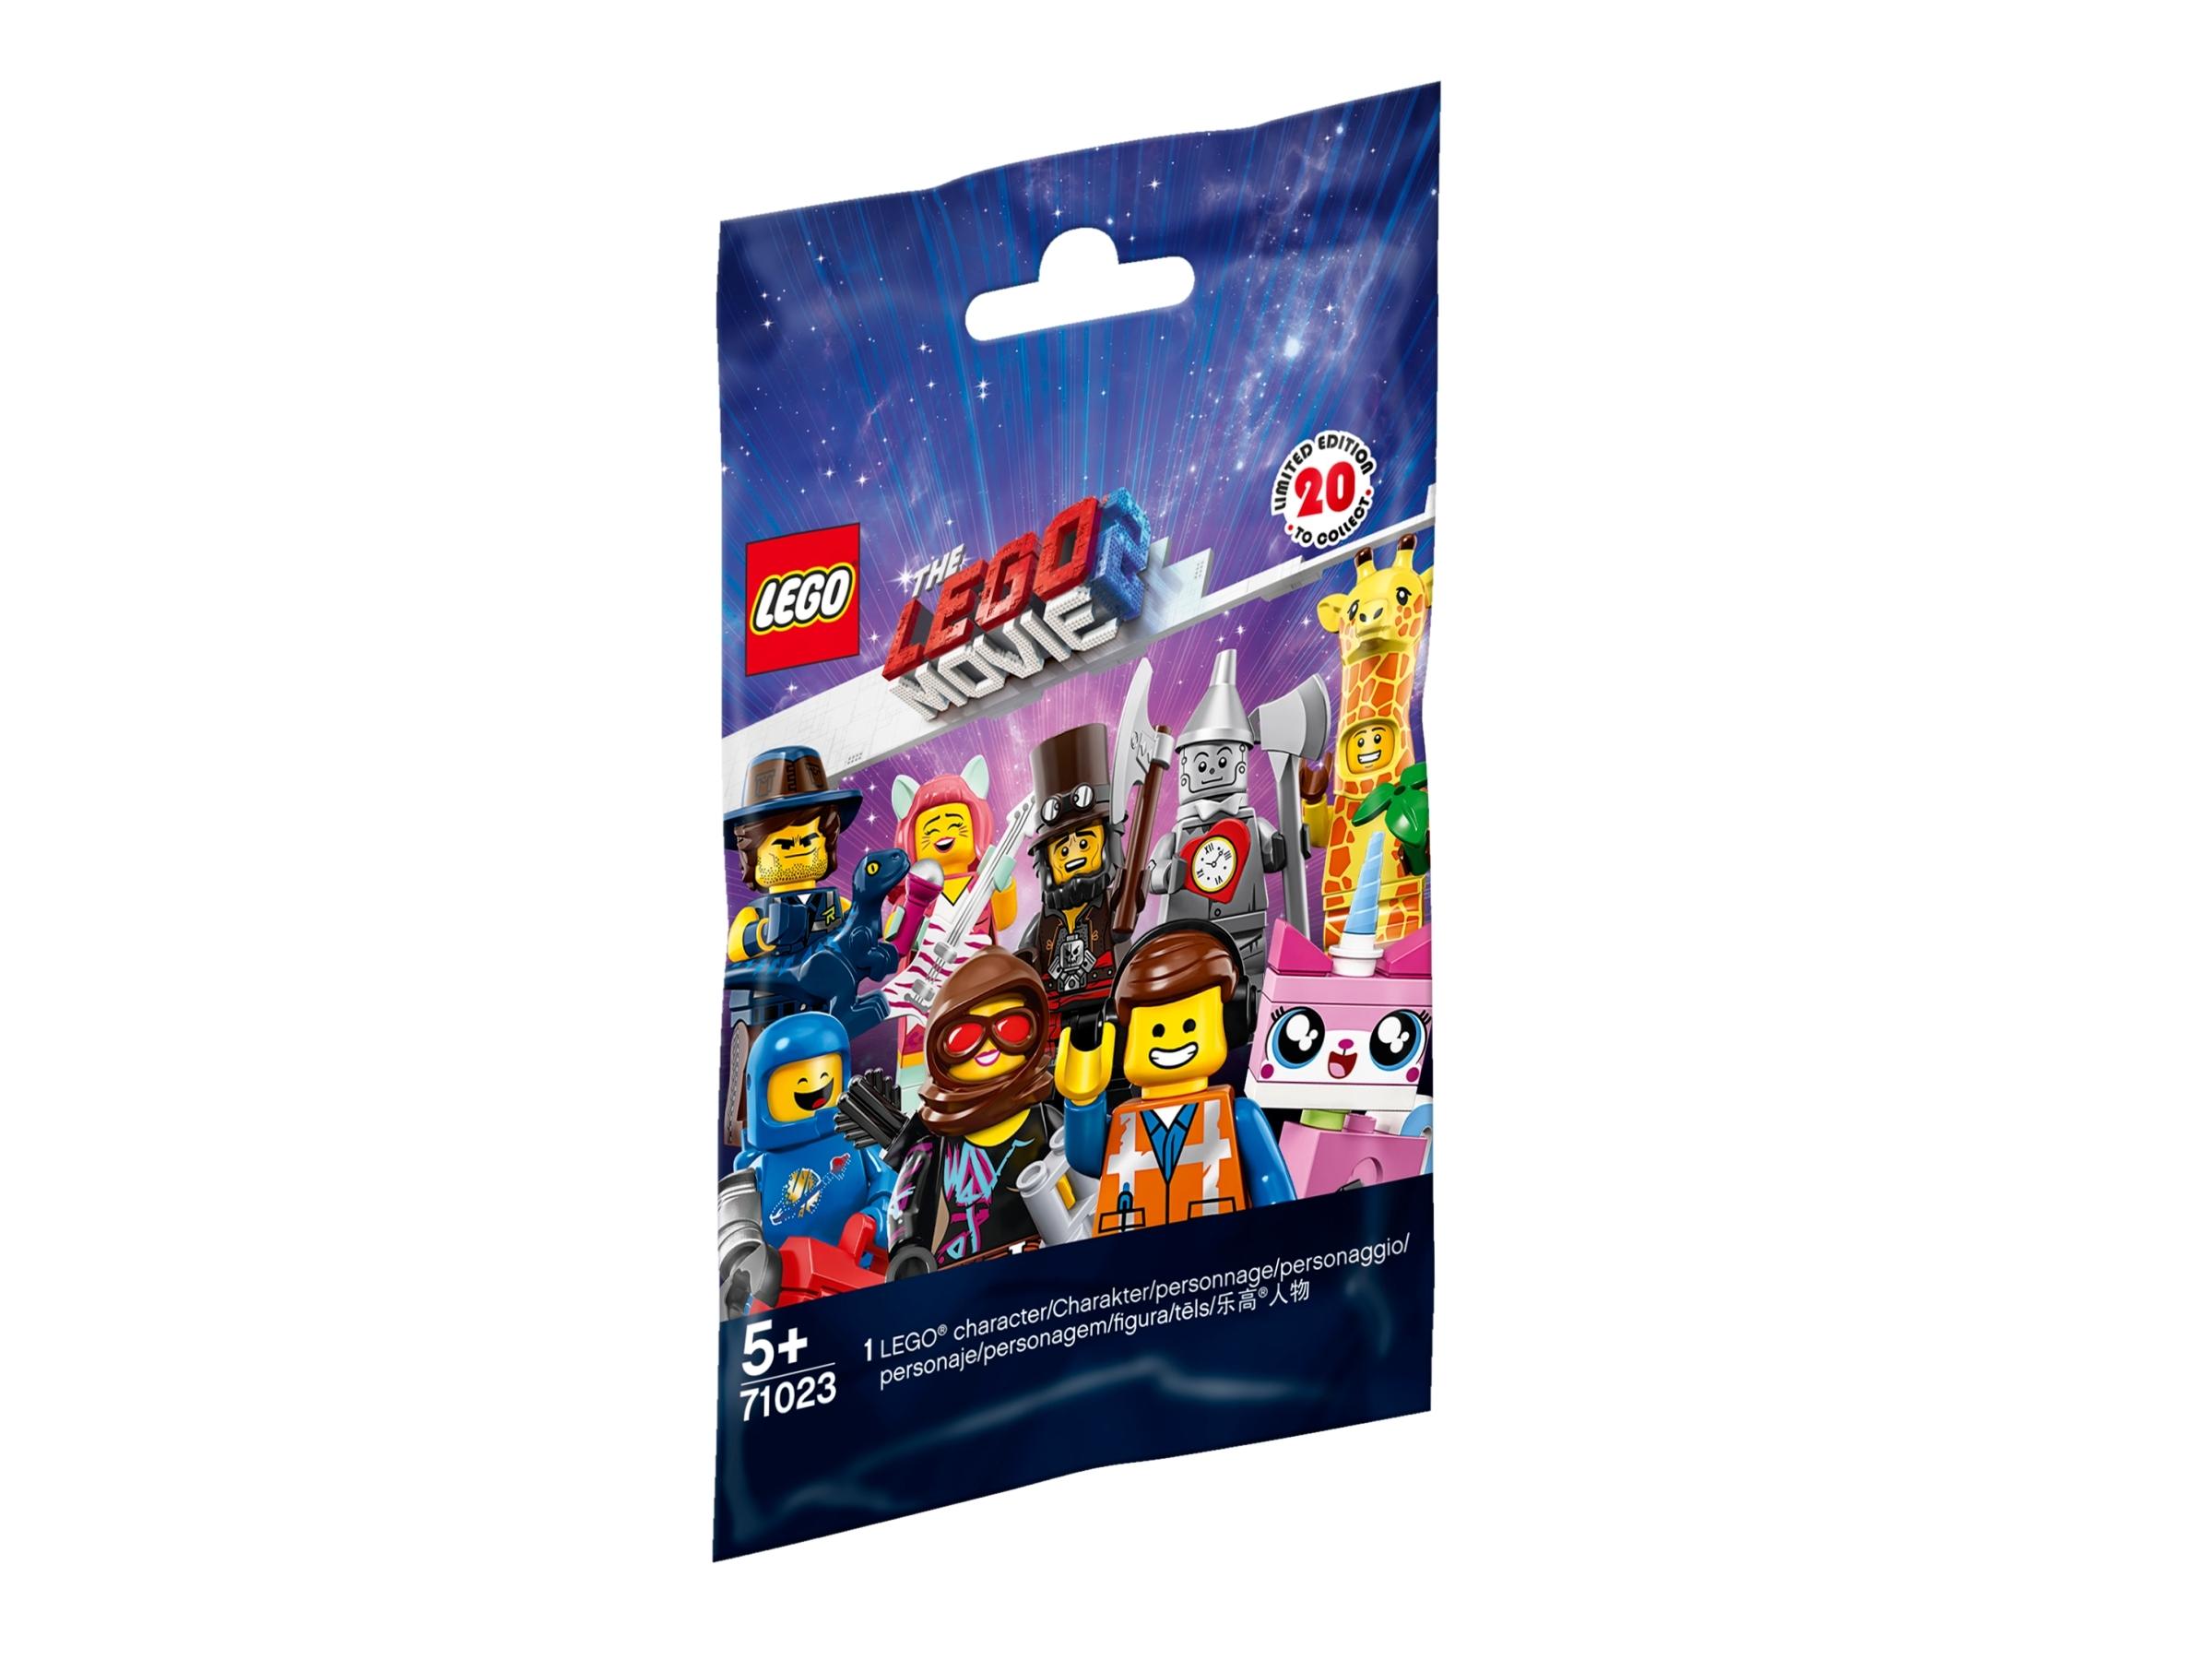 NEW UNOPENED!!! LEGO MINIFIGURE LEGO MOVIE 2 71023 CRAYON GIRL